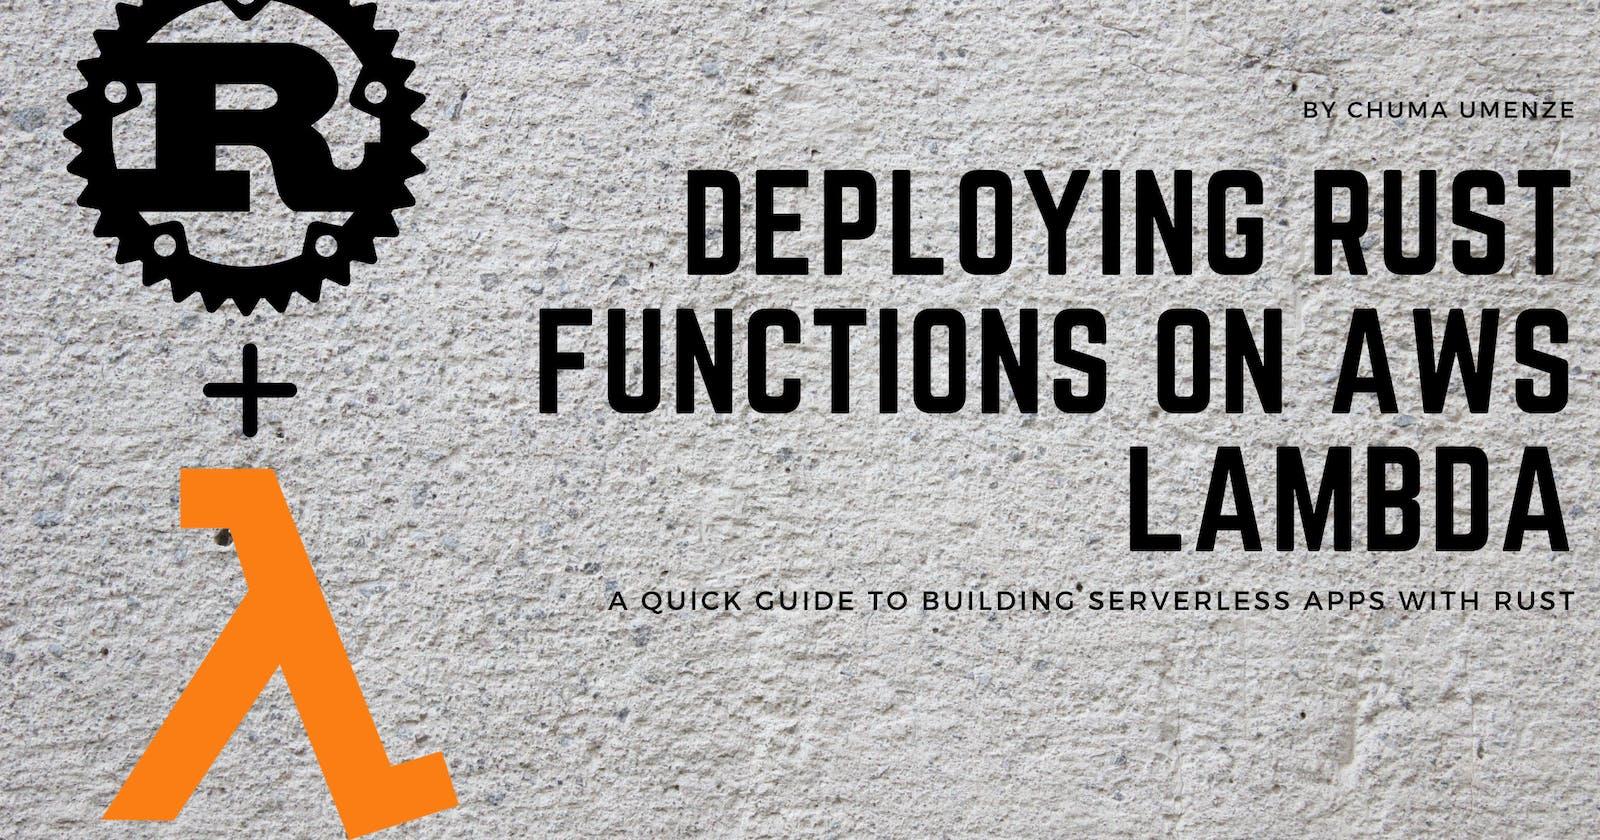 Deploying Rust Functions on AWS Lambda